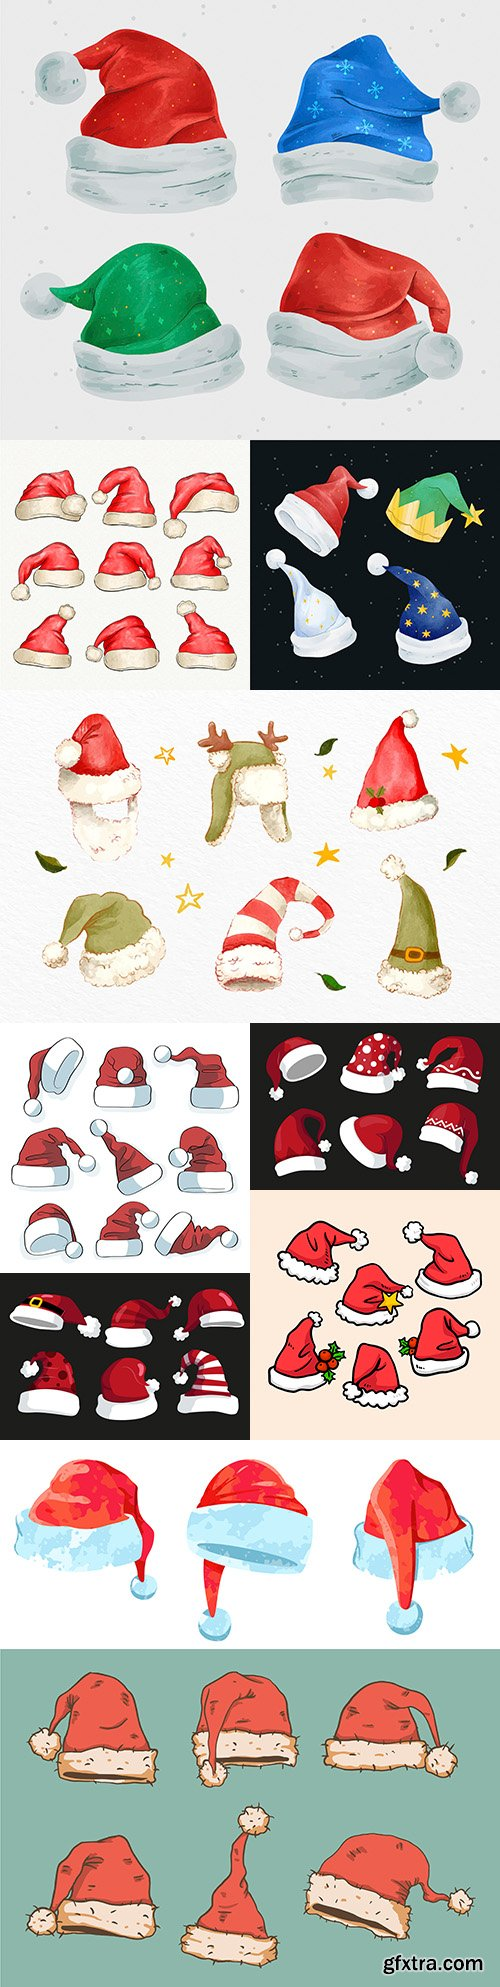 Santa Claus hat cartoon Christmas icons set isolated